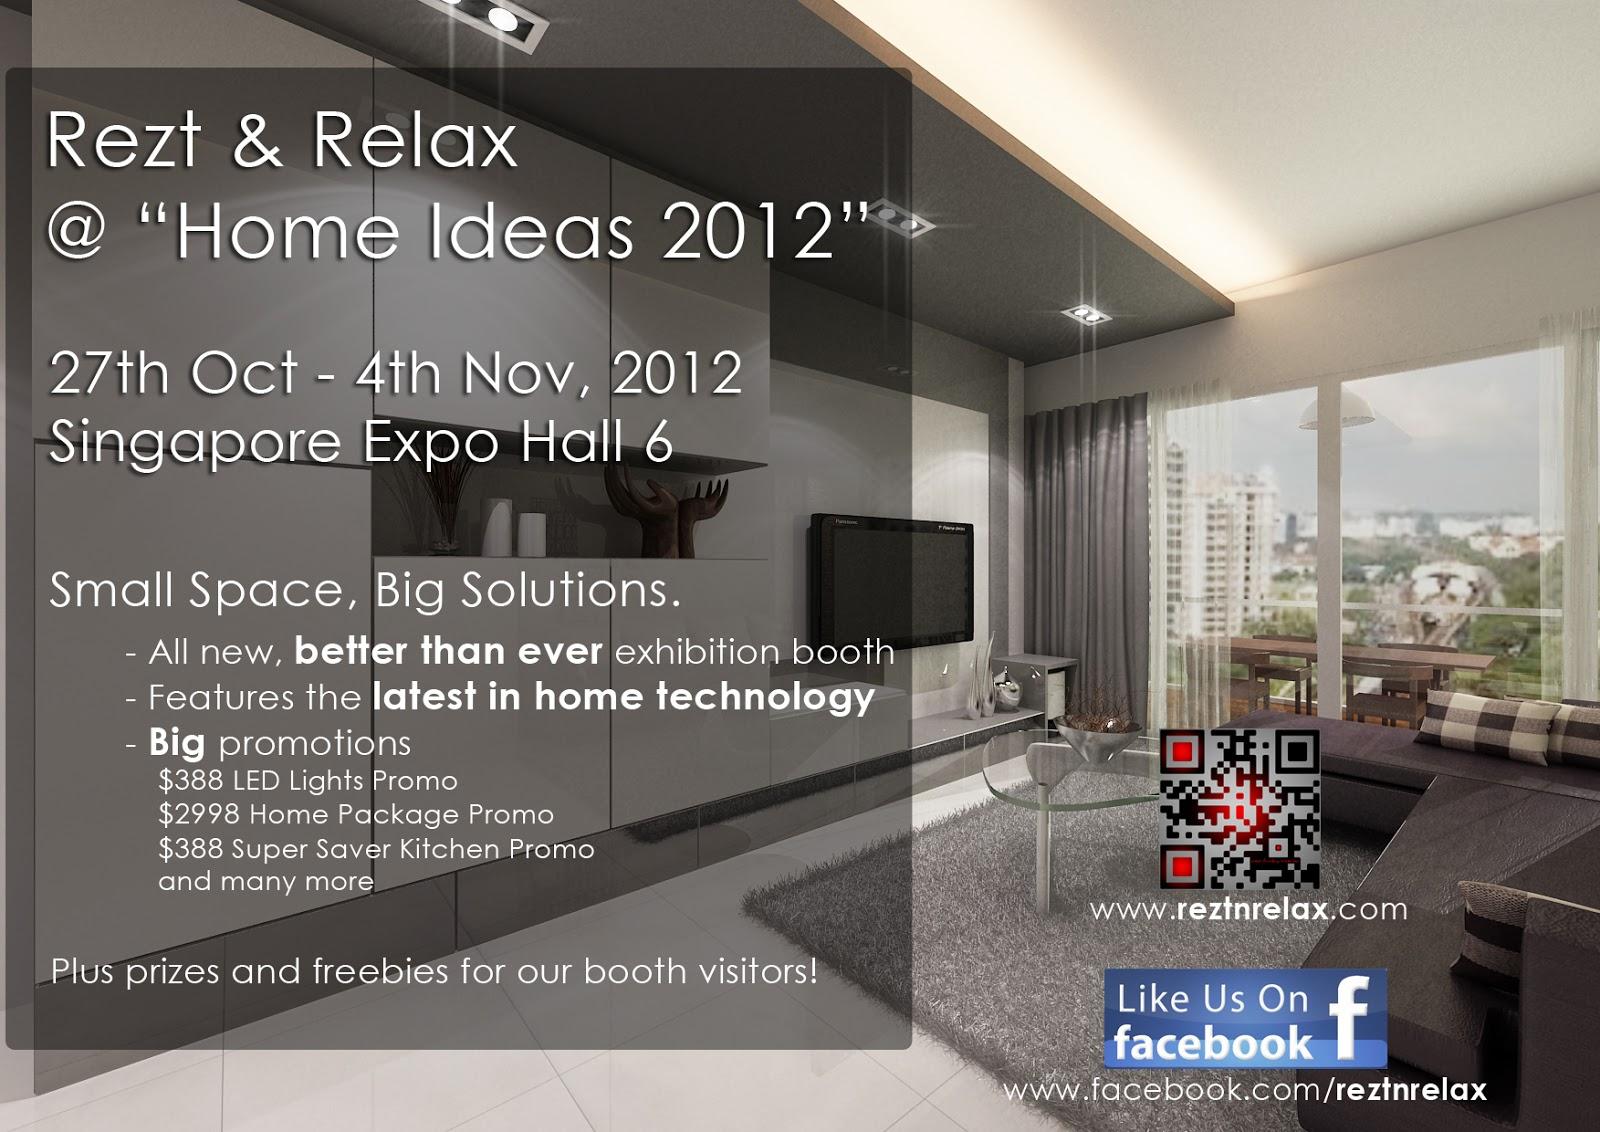 Interior Design Chatter October 2012 Rezt Relax Interior Design